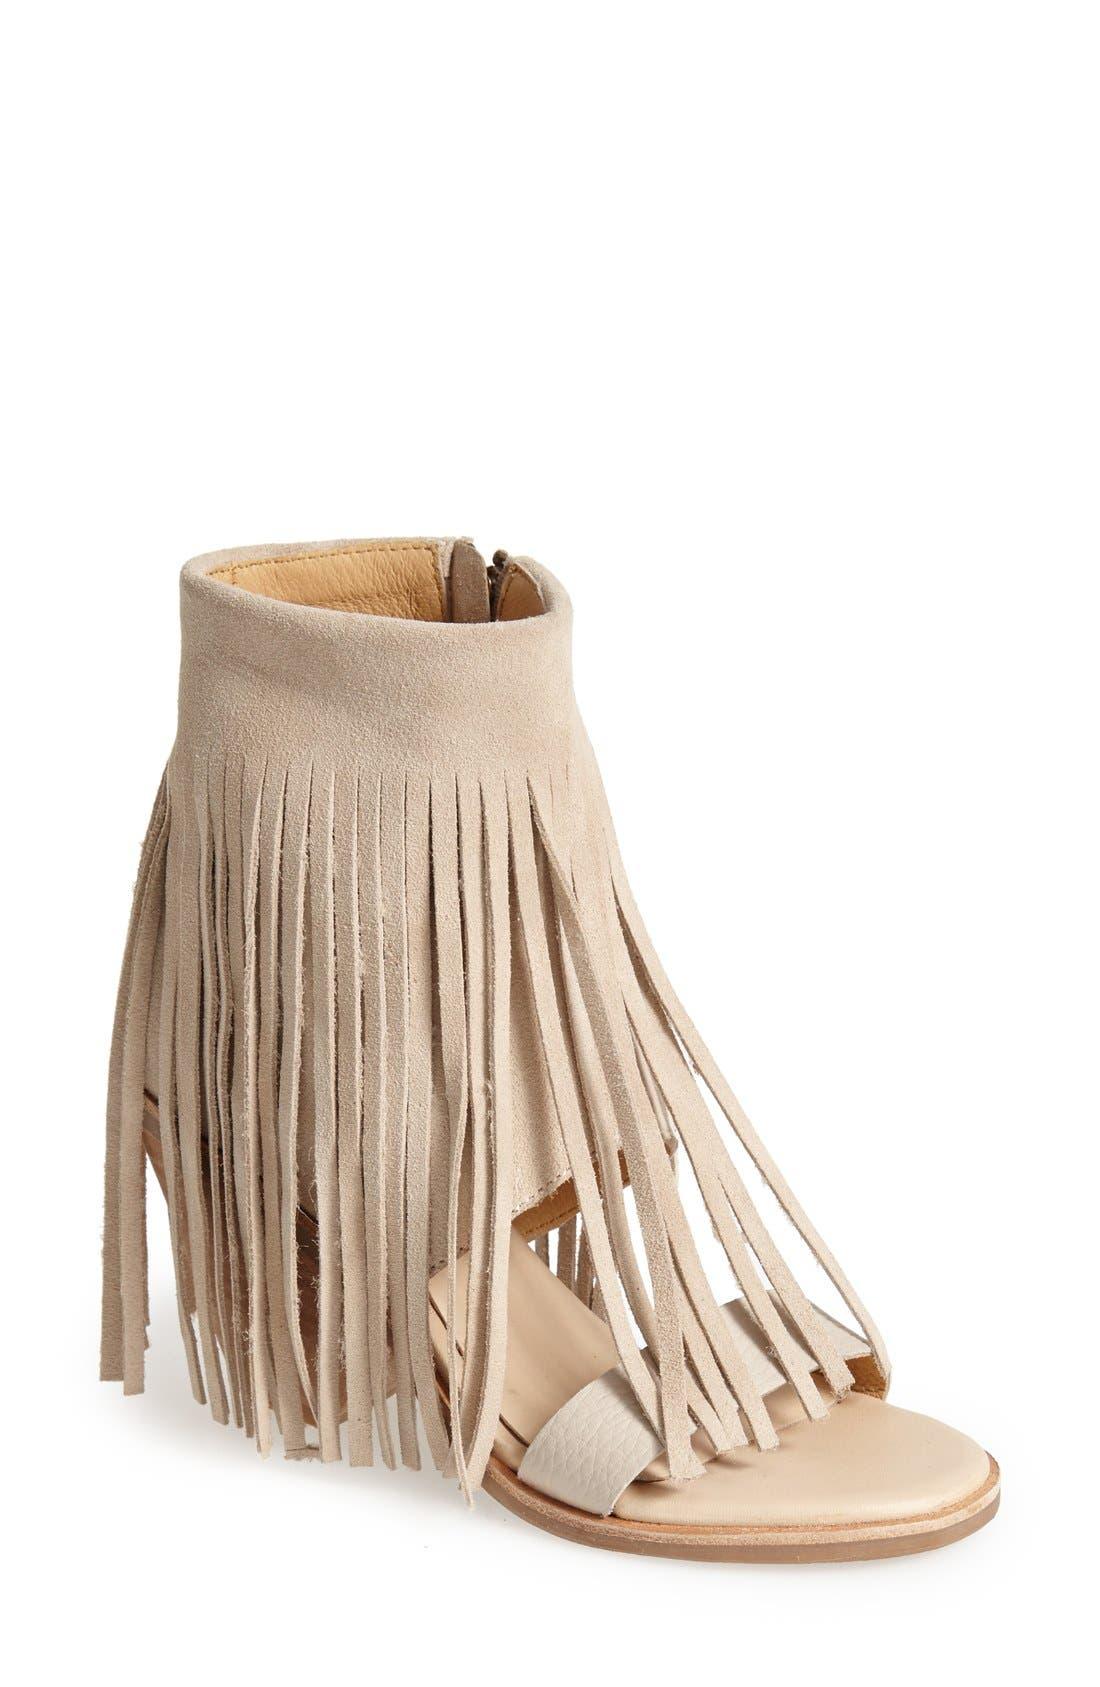 Main Image - Koolaburra 'Piaz II' Fringed Boot Cuff Sandal